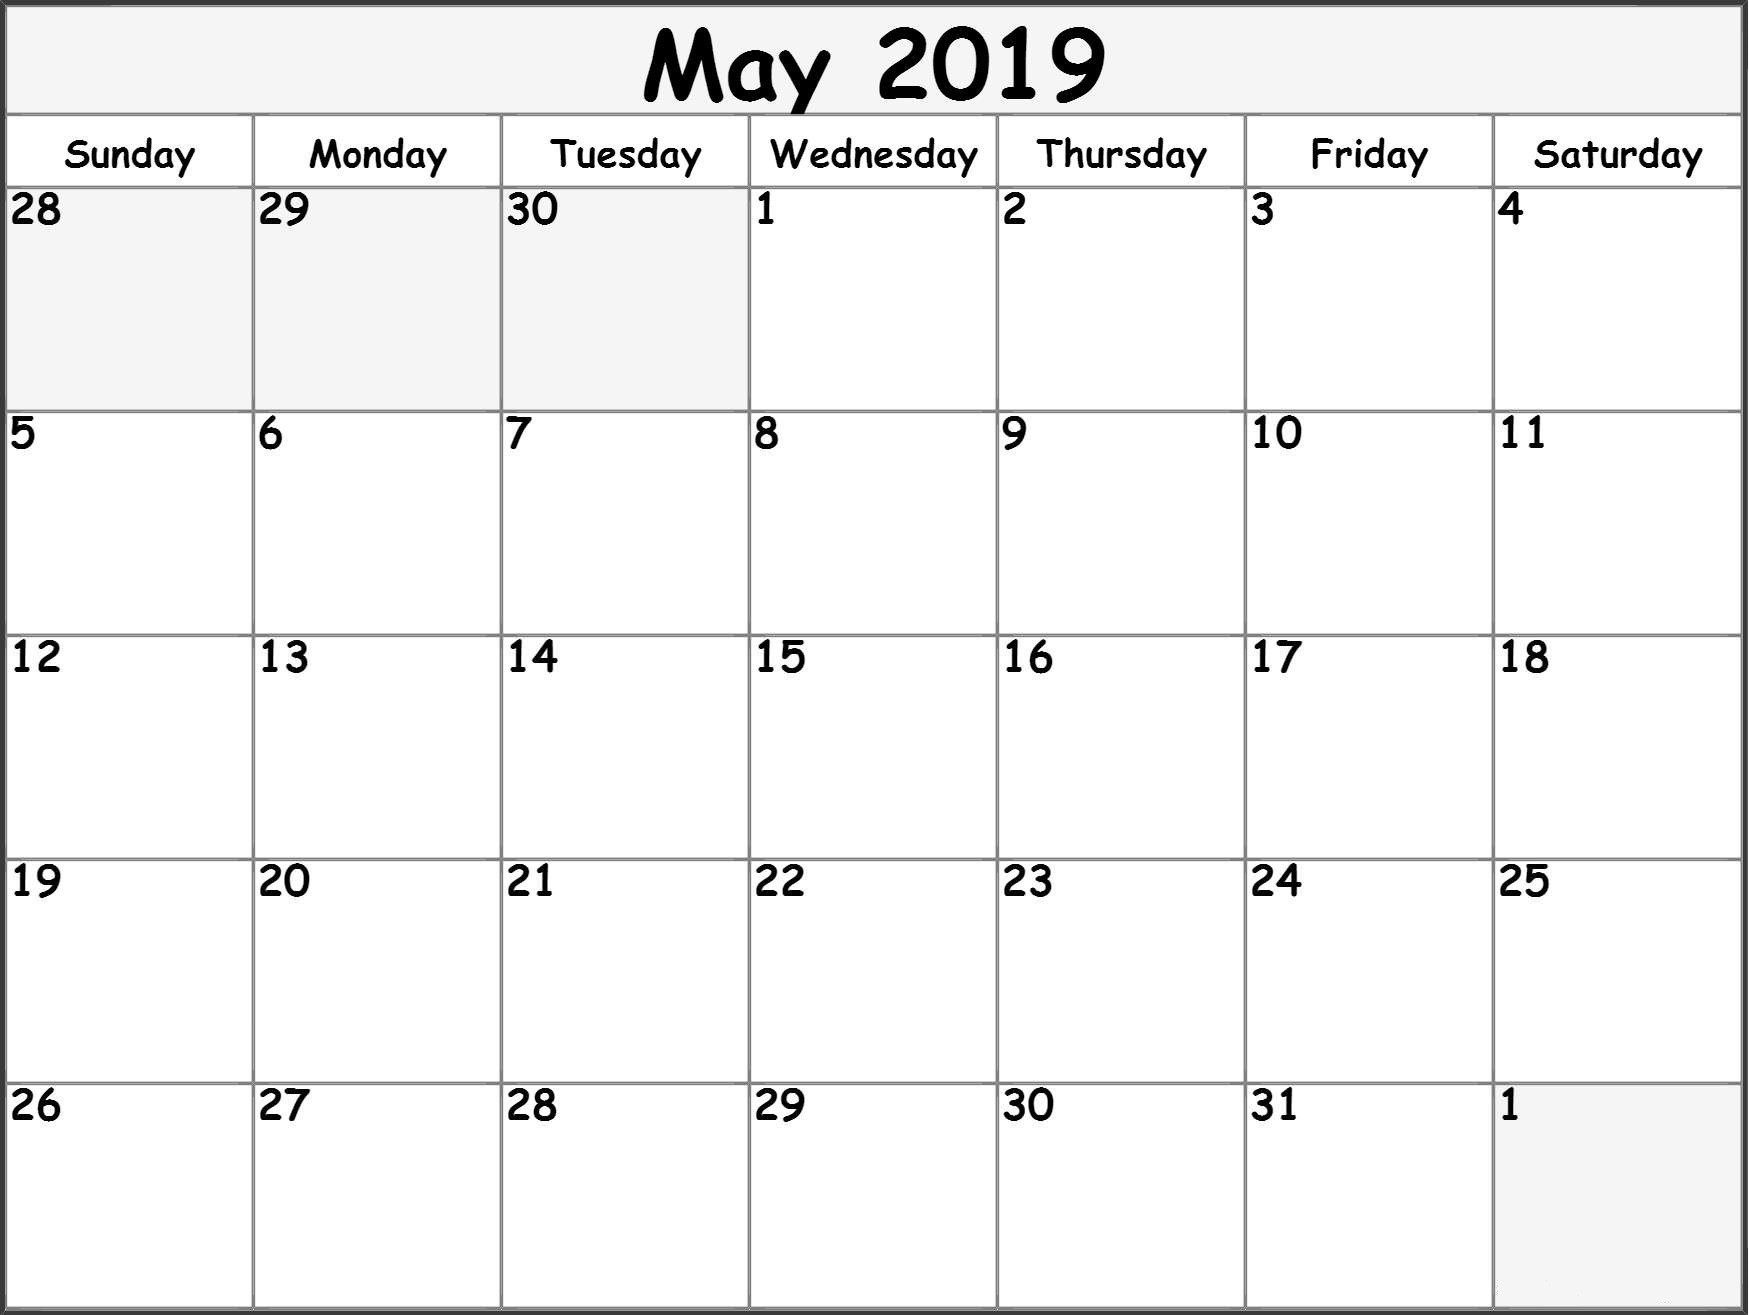 2019 May Calendar Printable May 2019 Printable Calendar Templates Free Blank Pdf